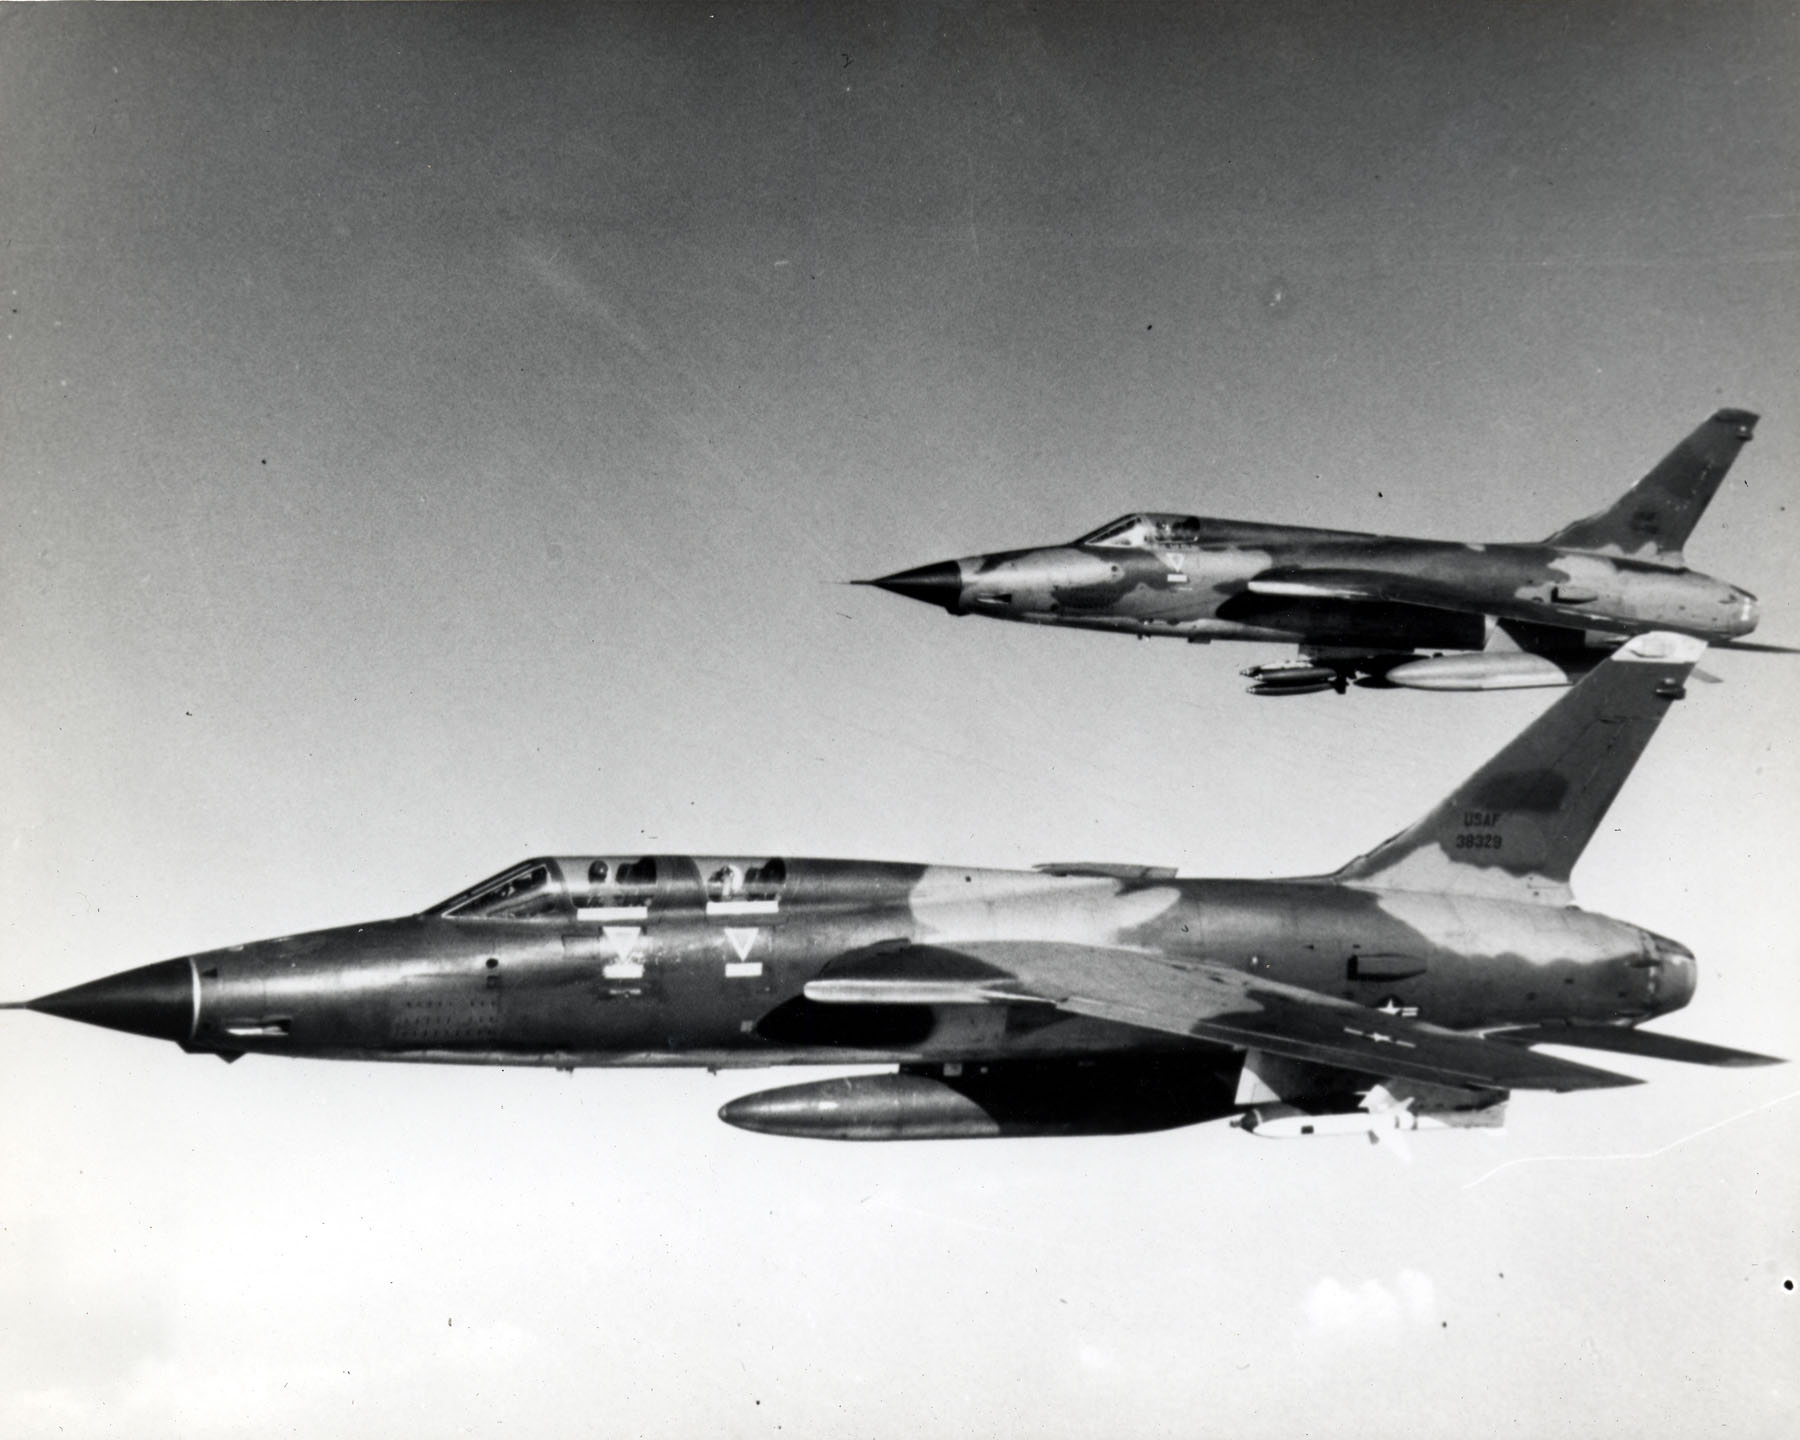 The Aviationist Wild Weasel Diagram Automotive Electrical Symbols Lockheed F 104 Hunter Killer Usaf